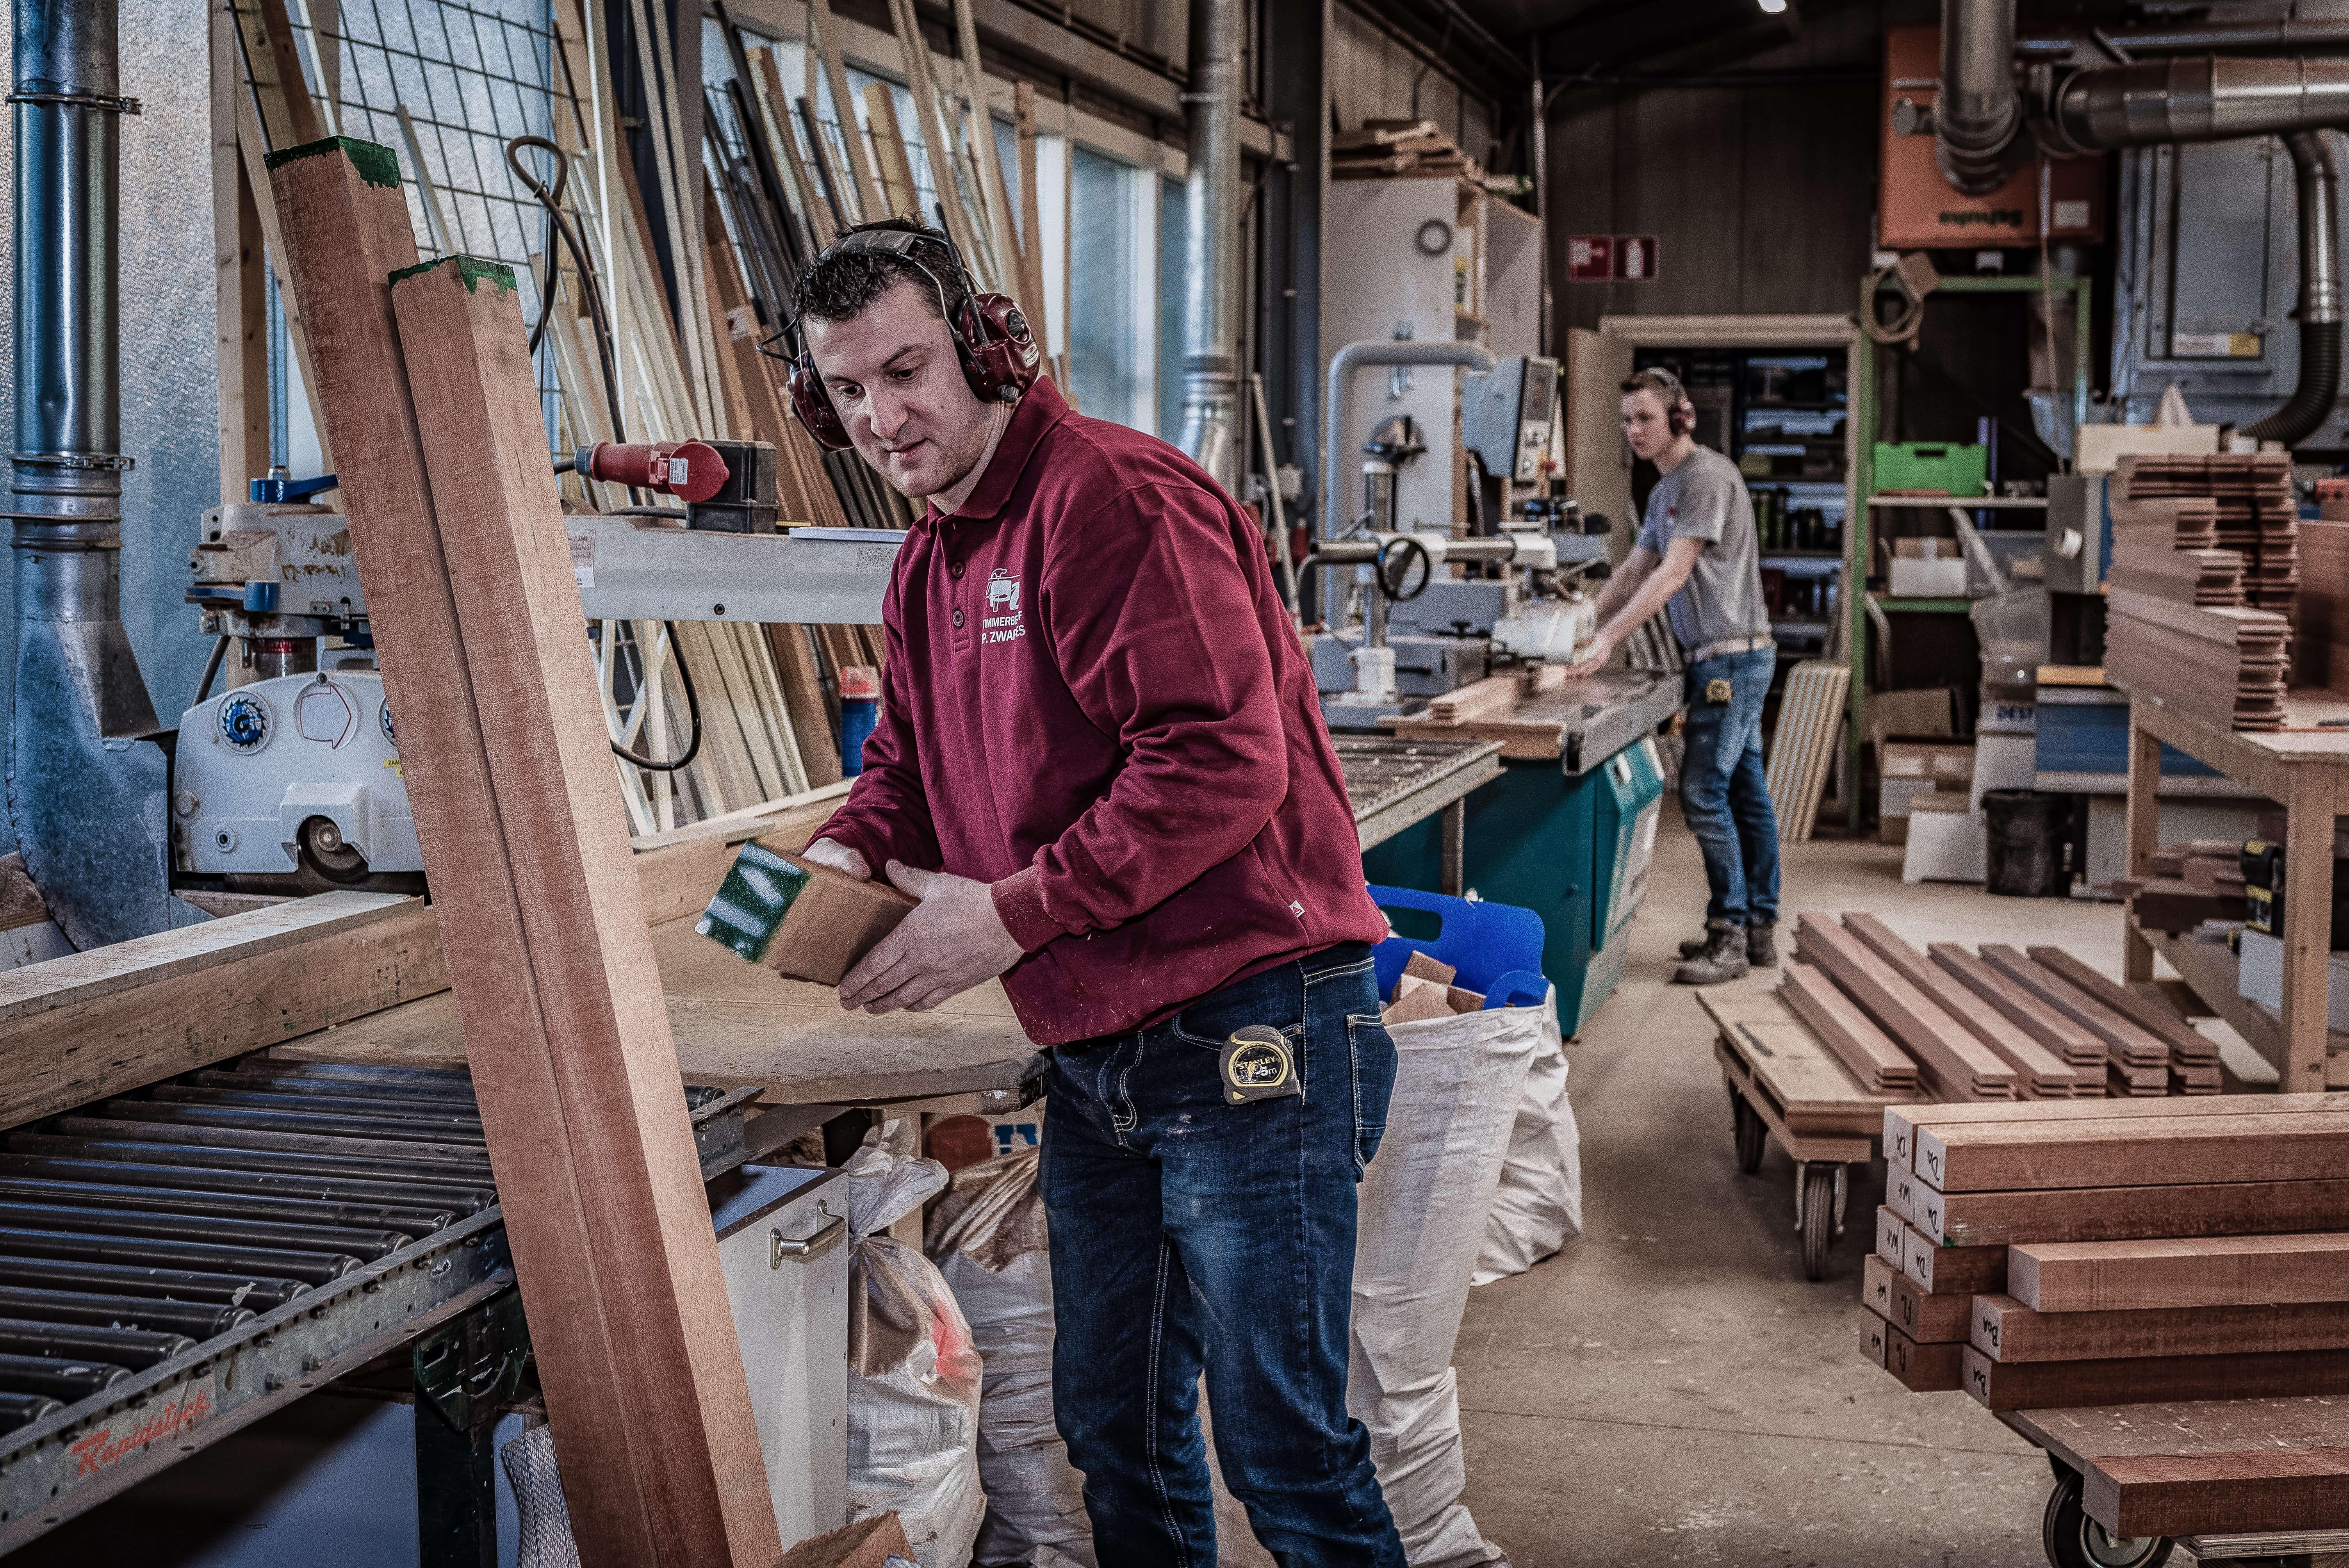 Timmerbedrijf Zeeland Timmerman